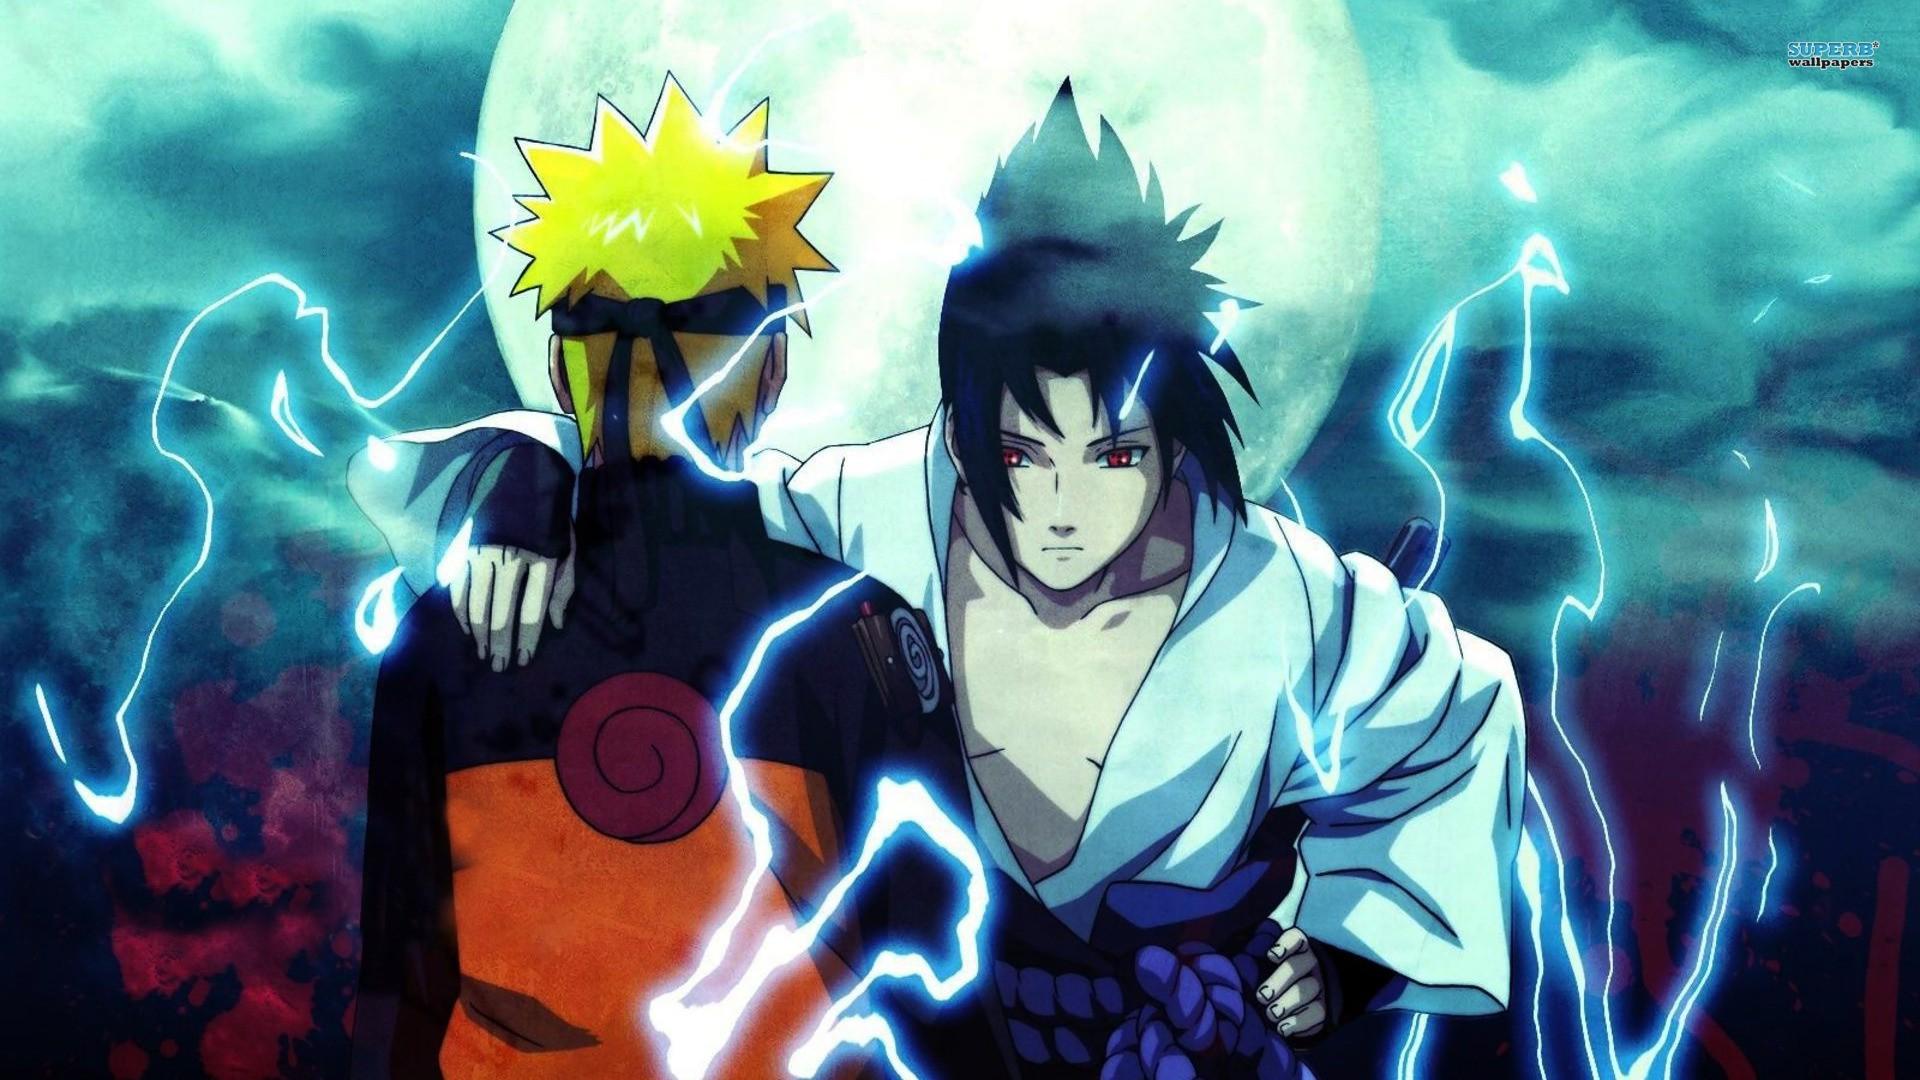 Naruto Hd Wallpapers 1080p 69 Images